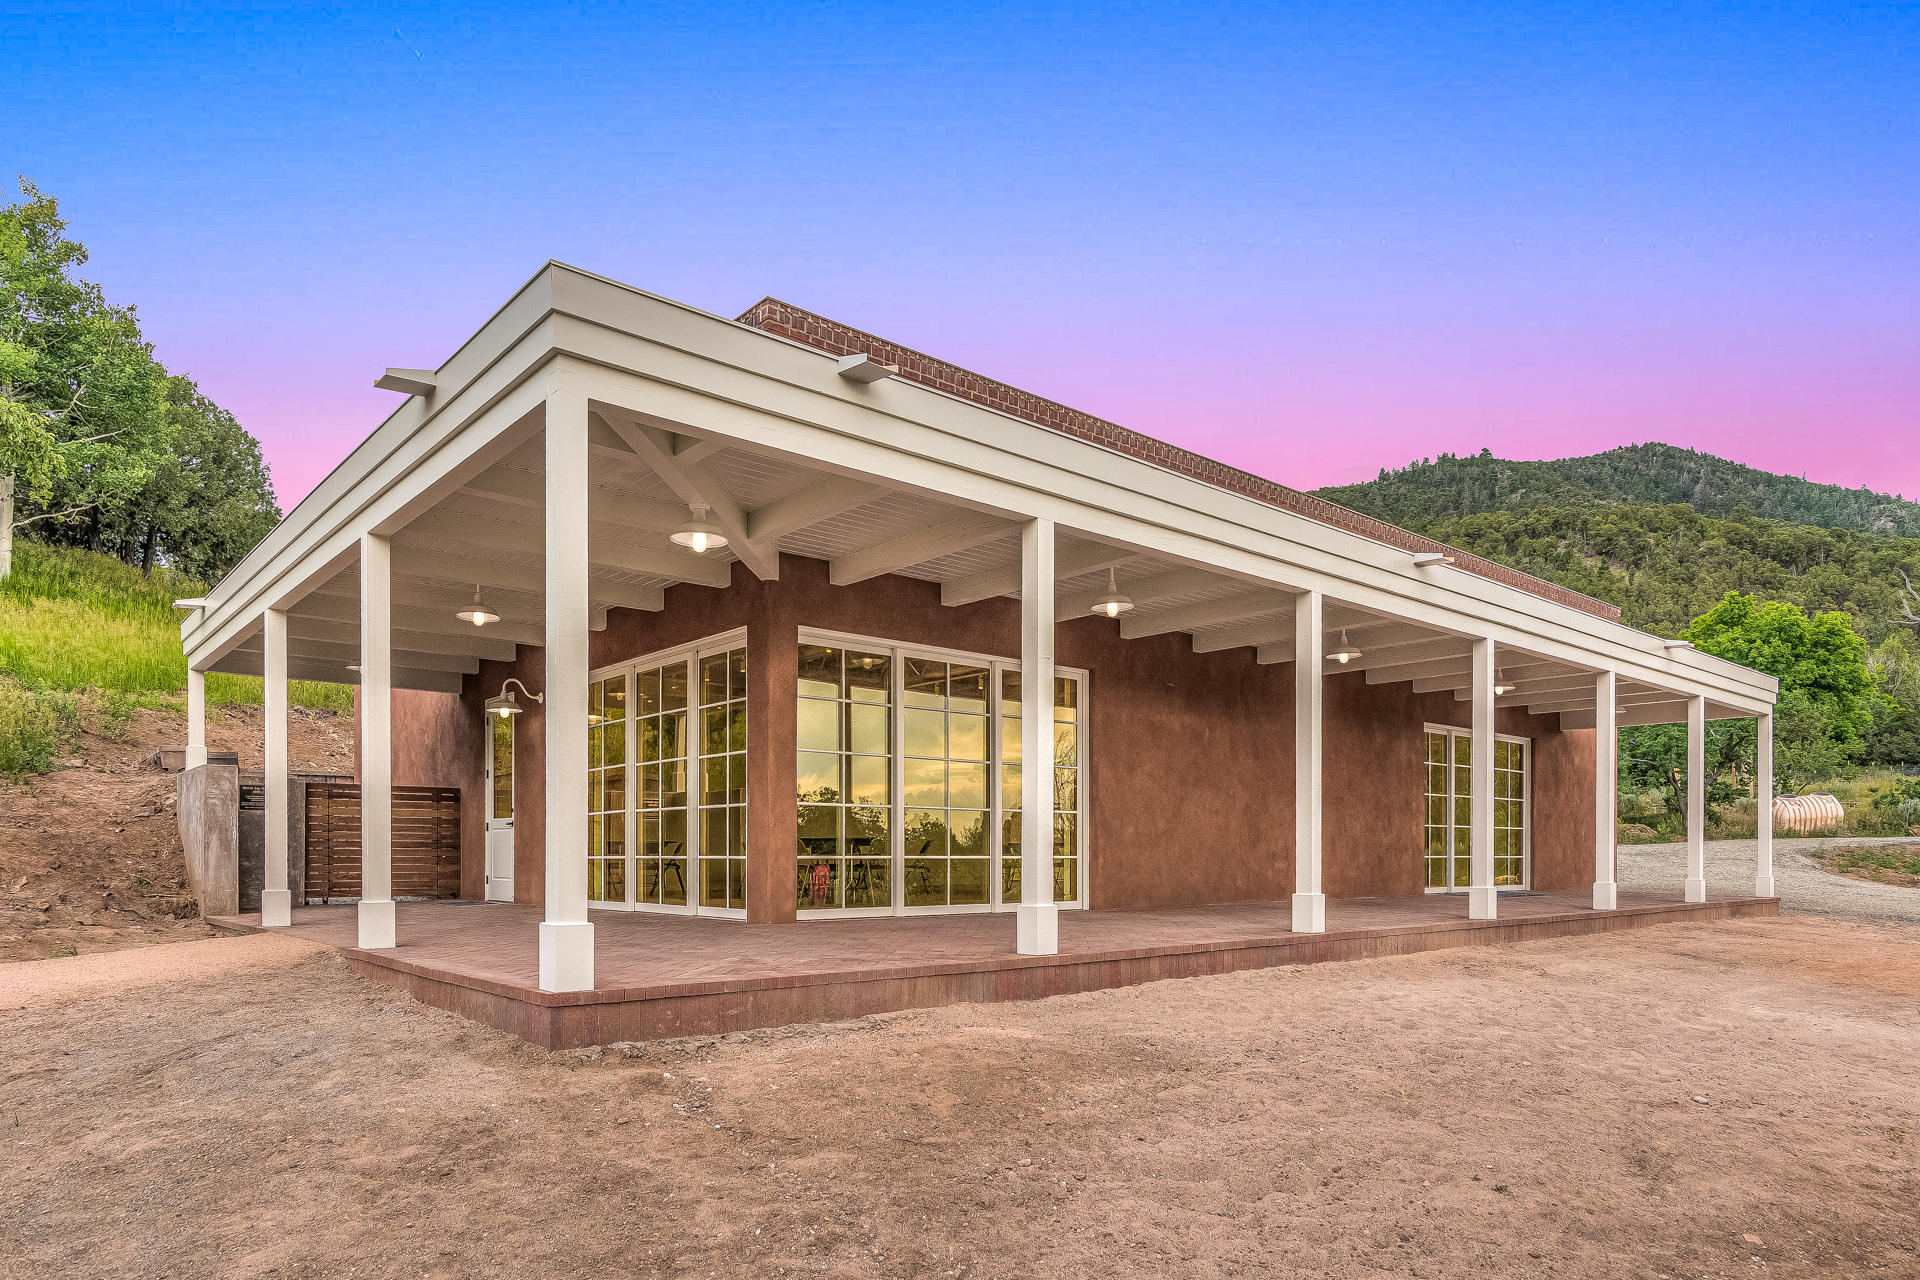 David Jay Henderson Pavilion